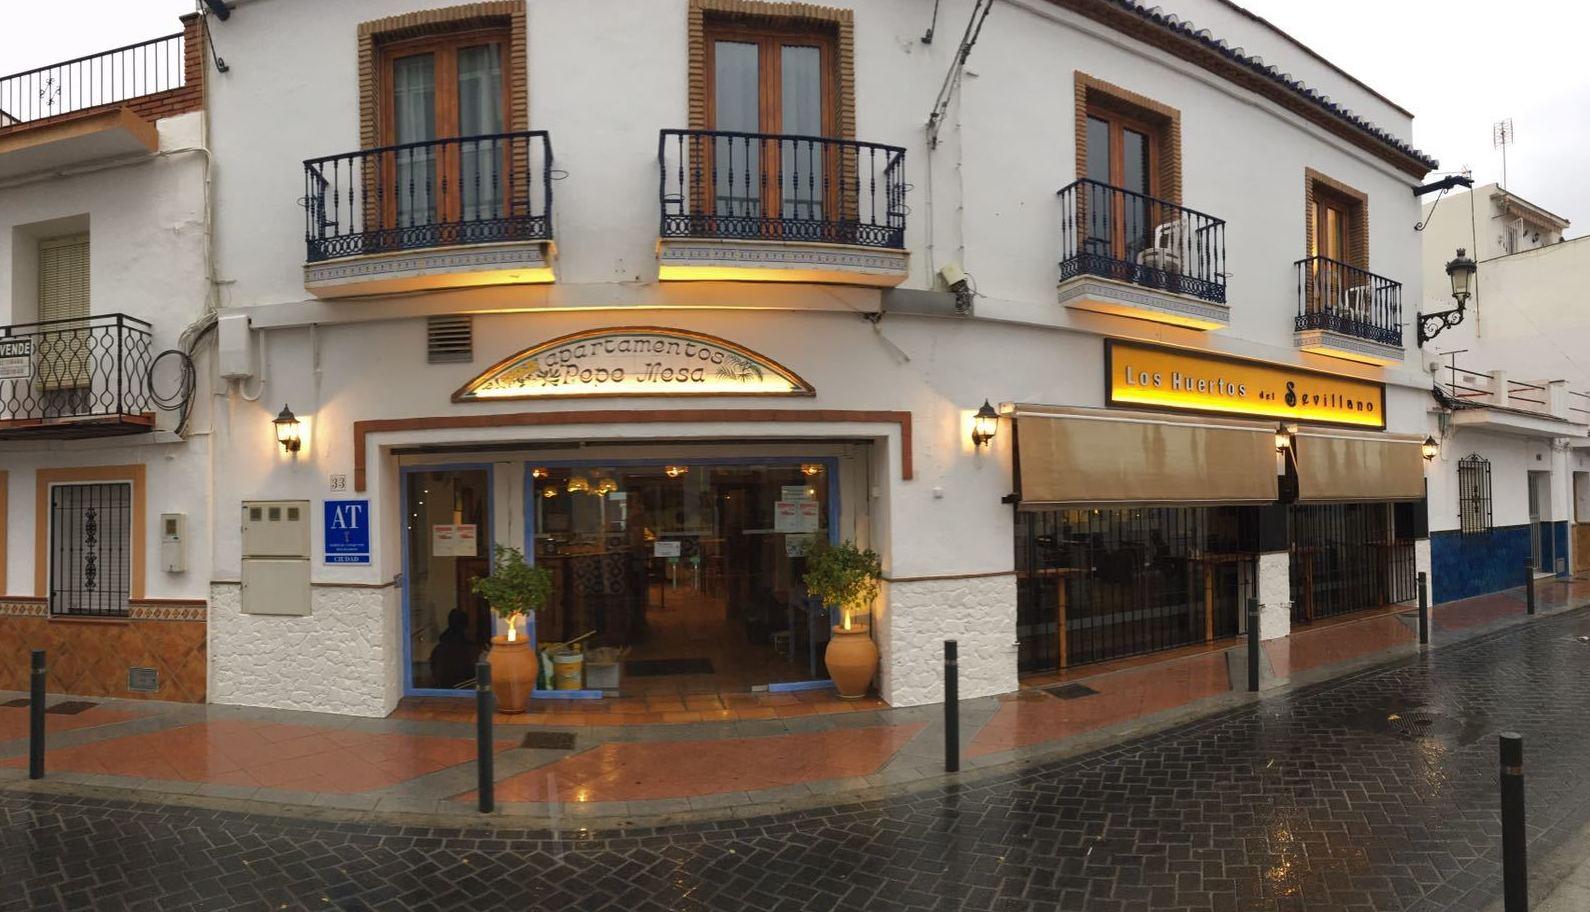 Foto 28 de Andalusian cuisine en Nerja | Restaurante Sevillano